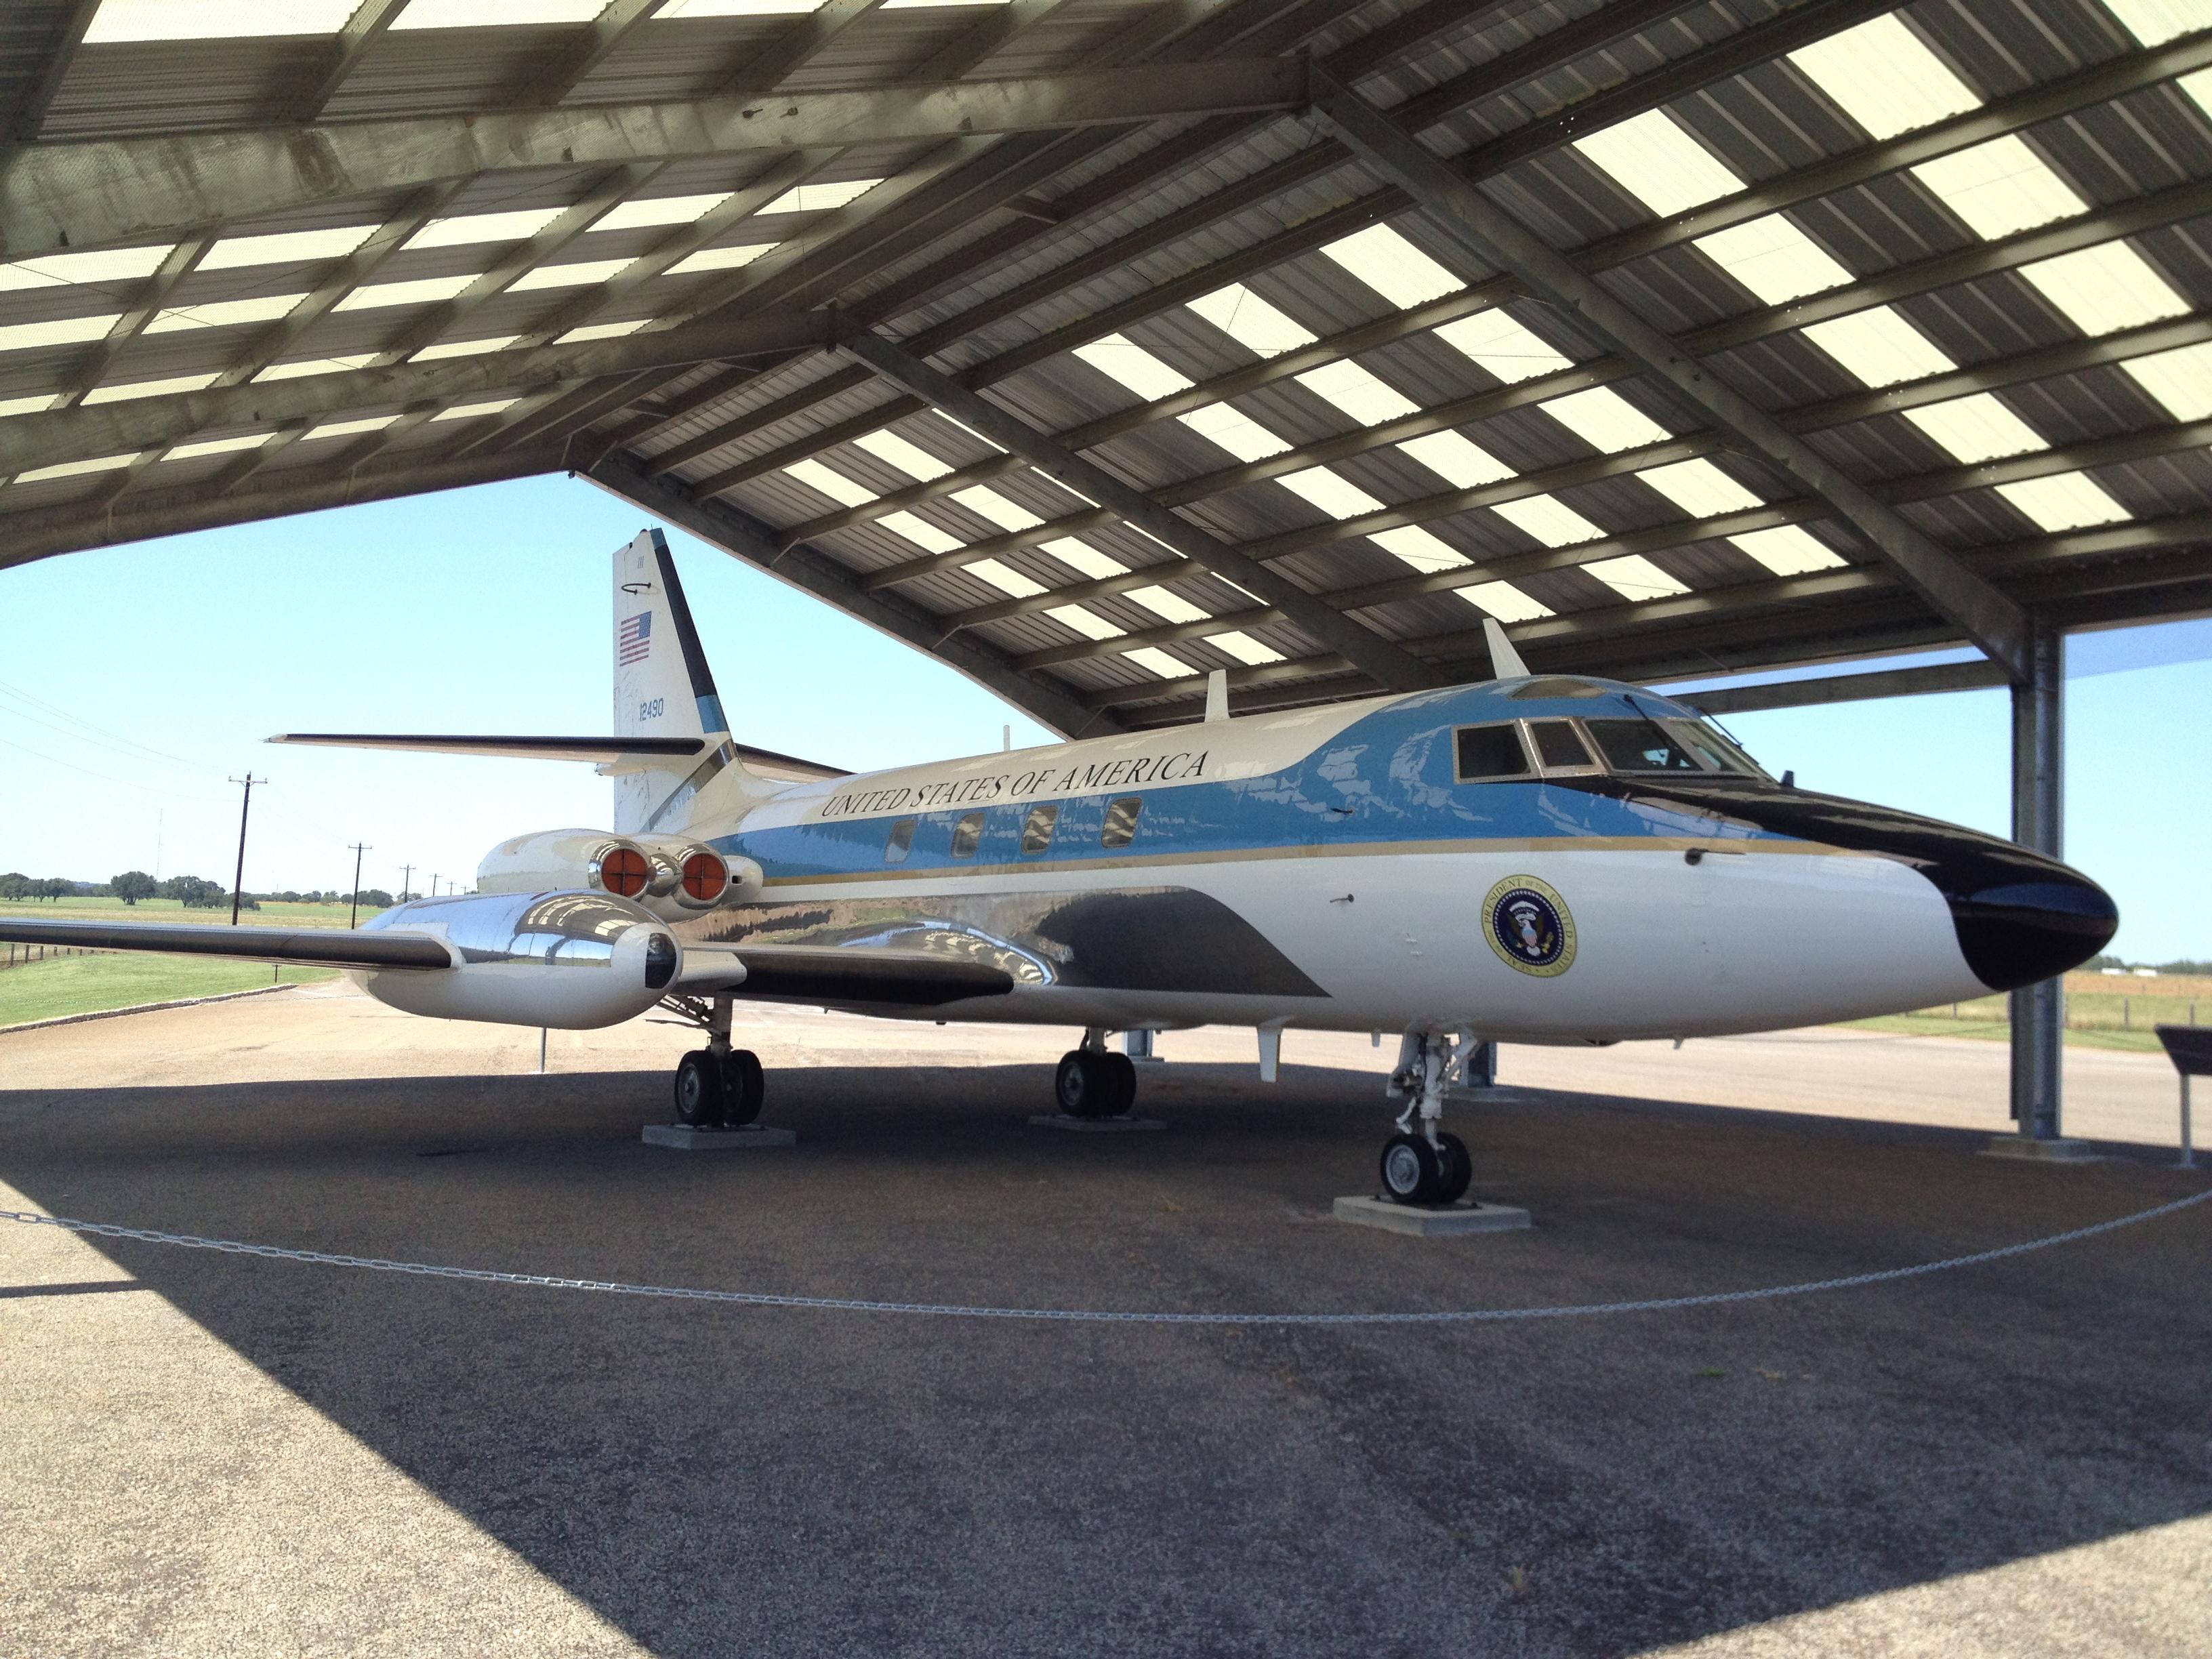 File Lockheed Jetstar Air One On Display Jpg Wikipedia